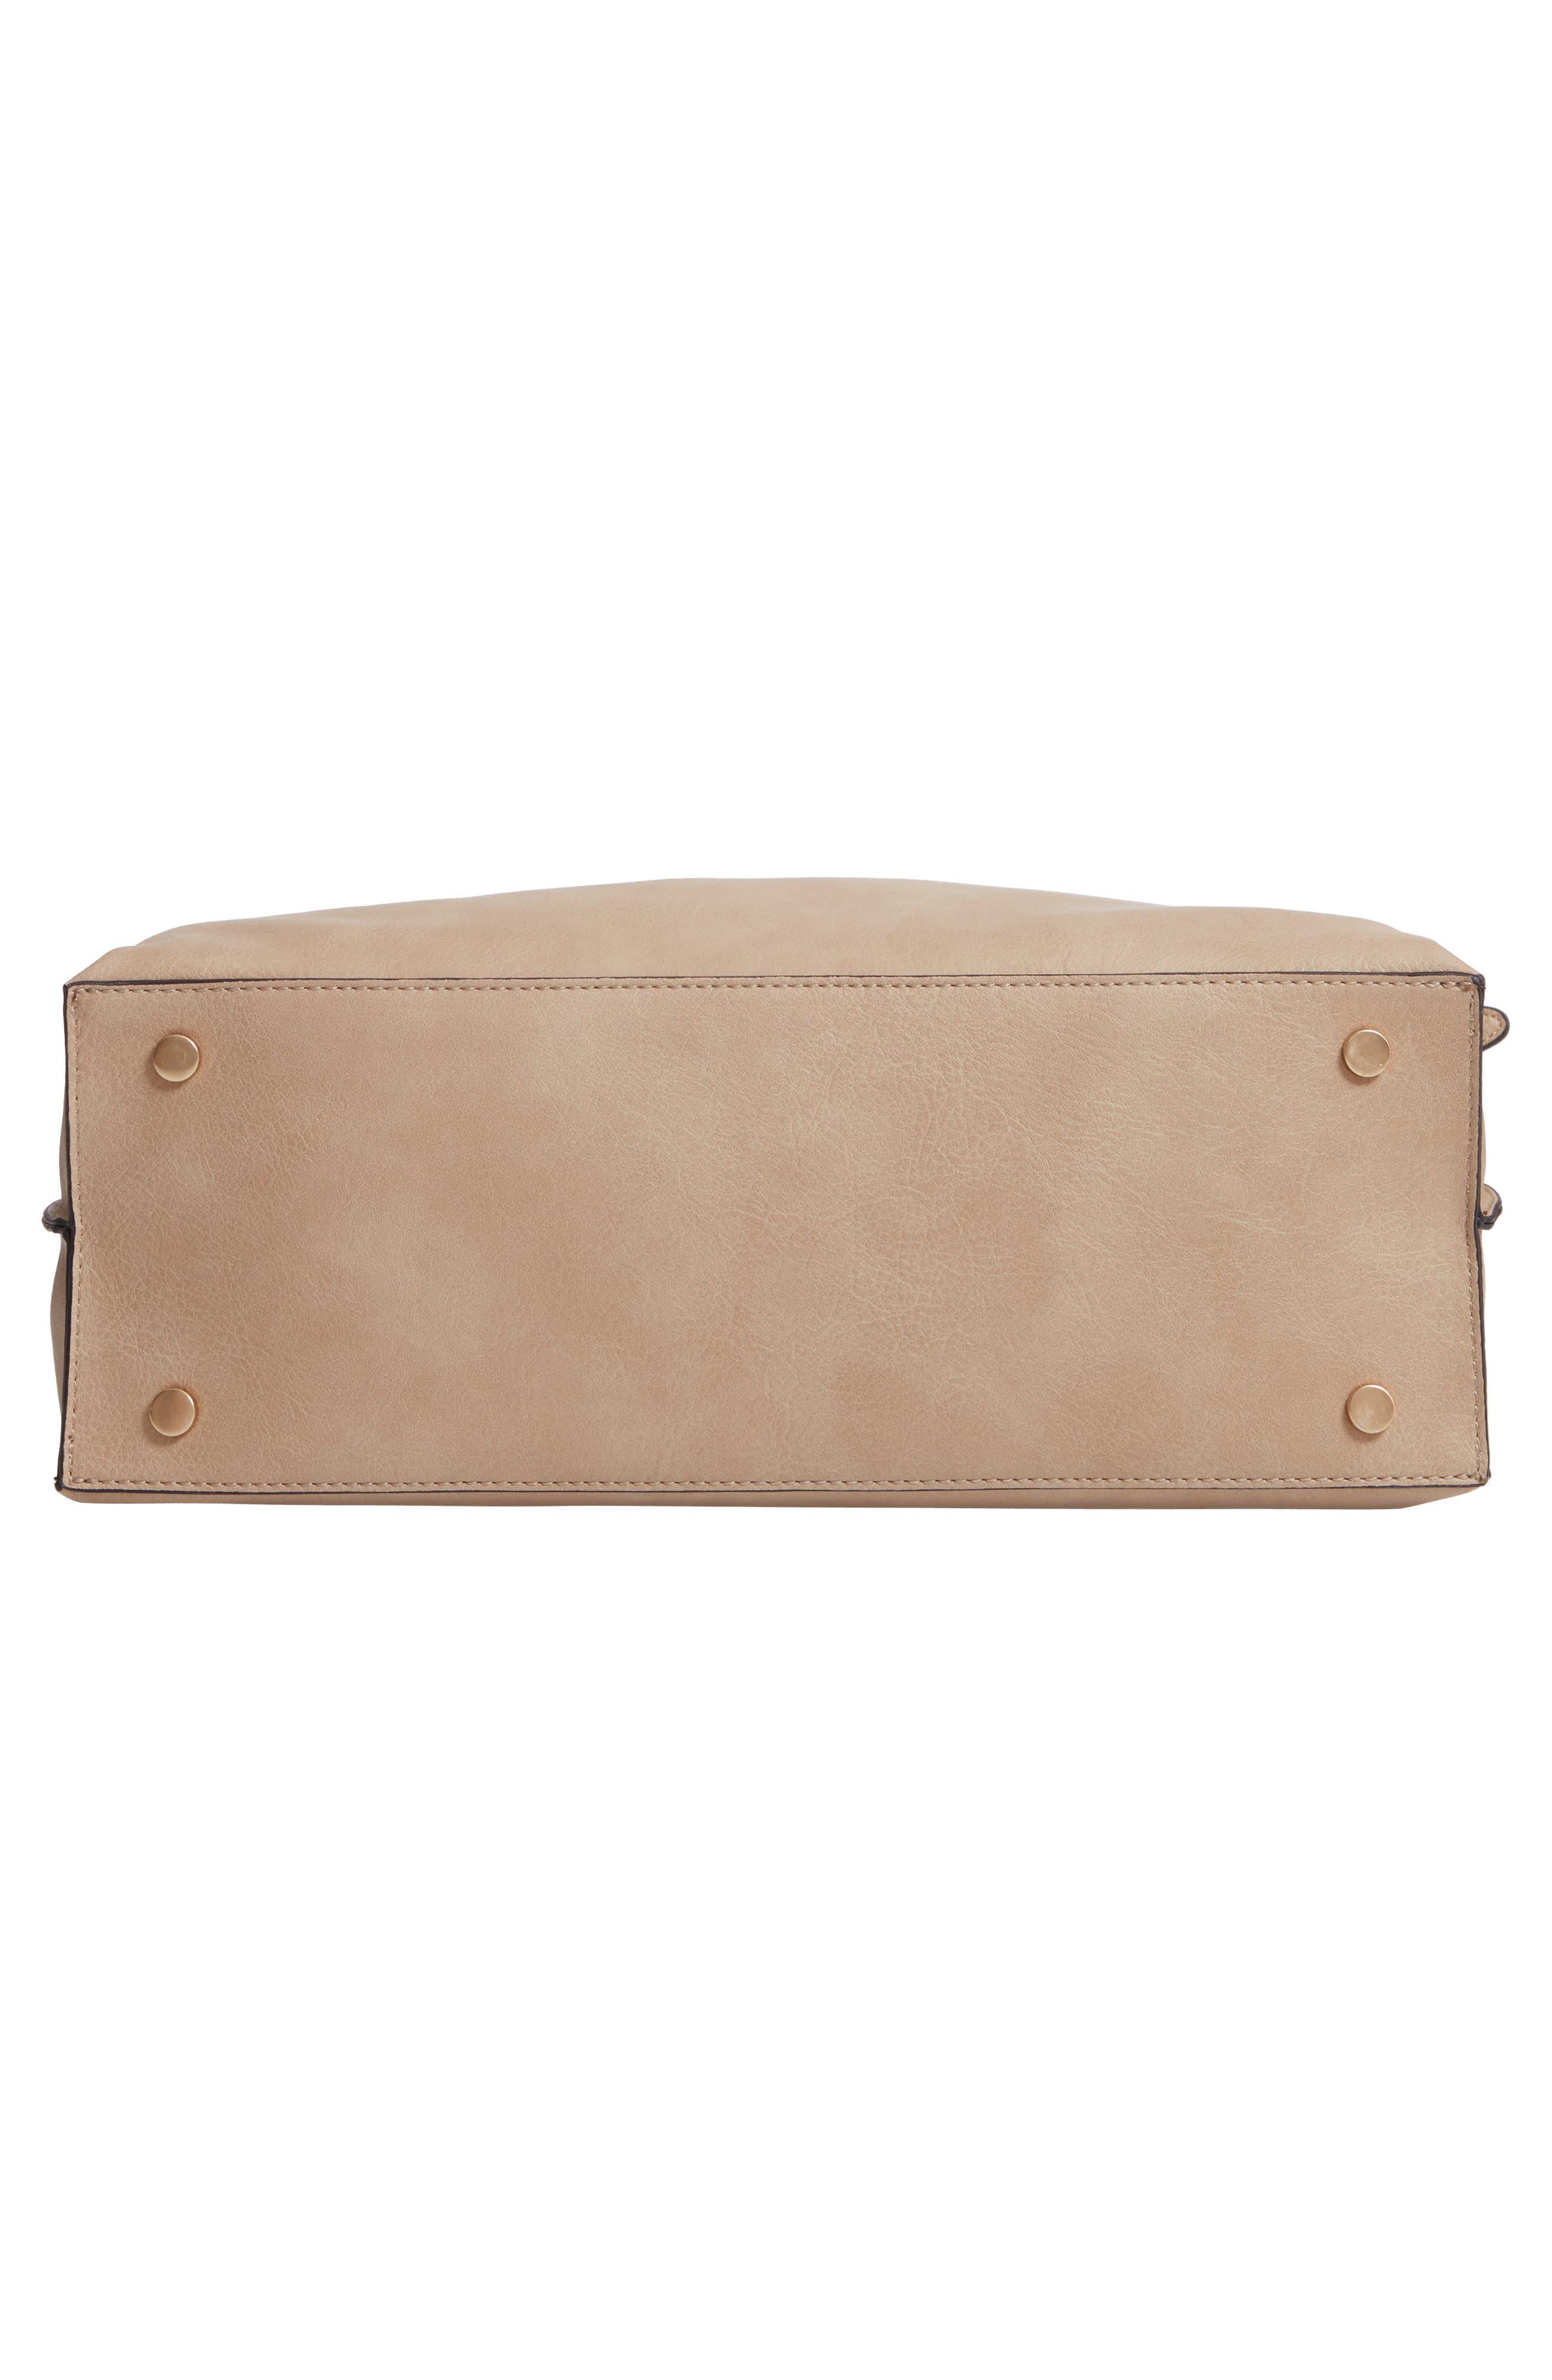 Josah Faux Leather Shoulder Bag,                             Alternate thumbnail 7, color,                             SAFARI